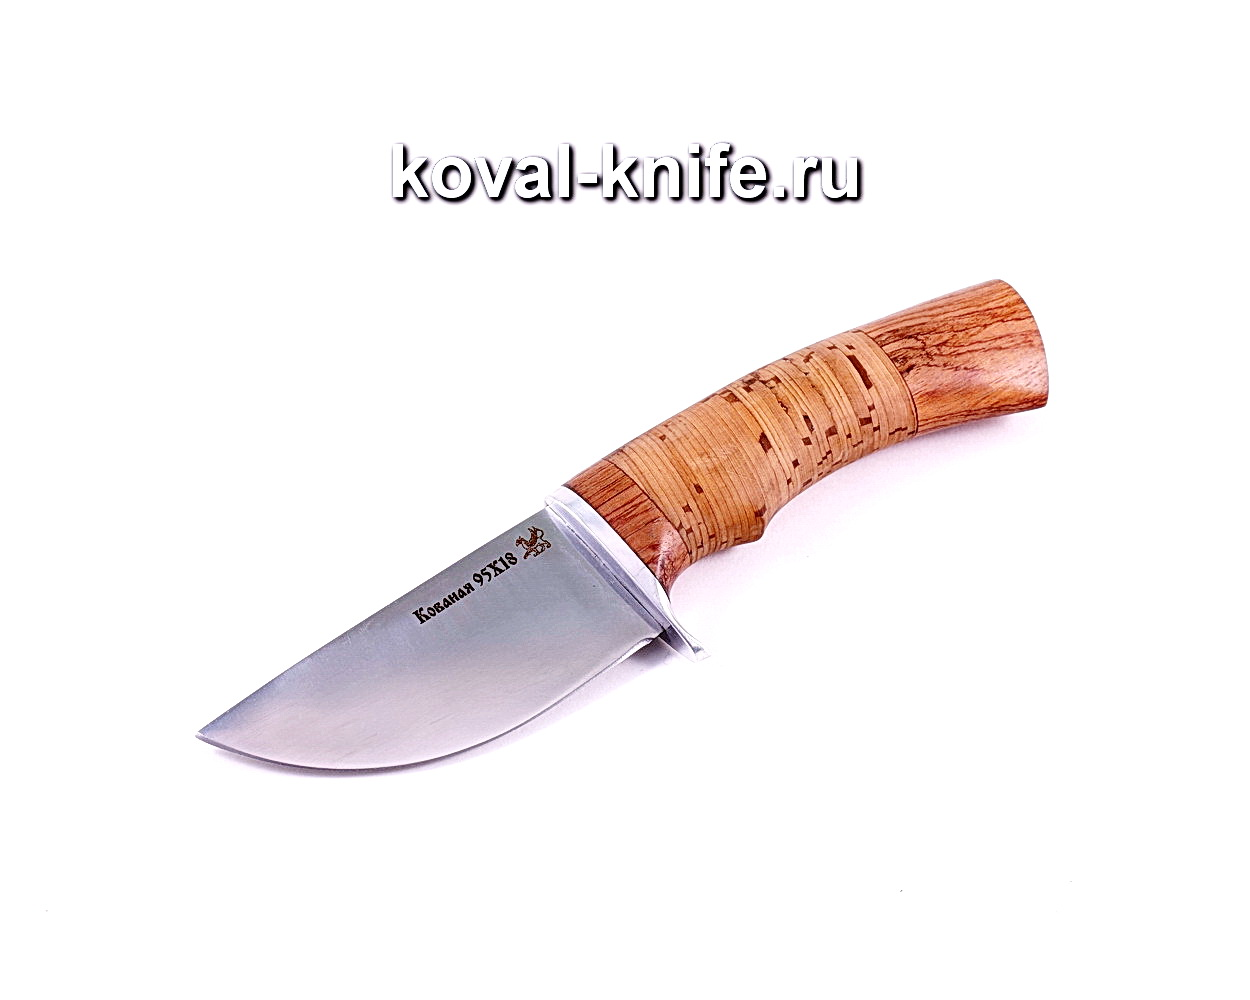 Нож Скин (сталь 95х18), рукоять бубинга, береста A027